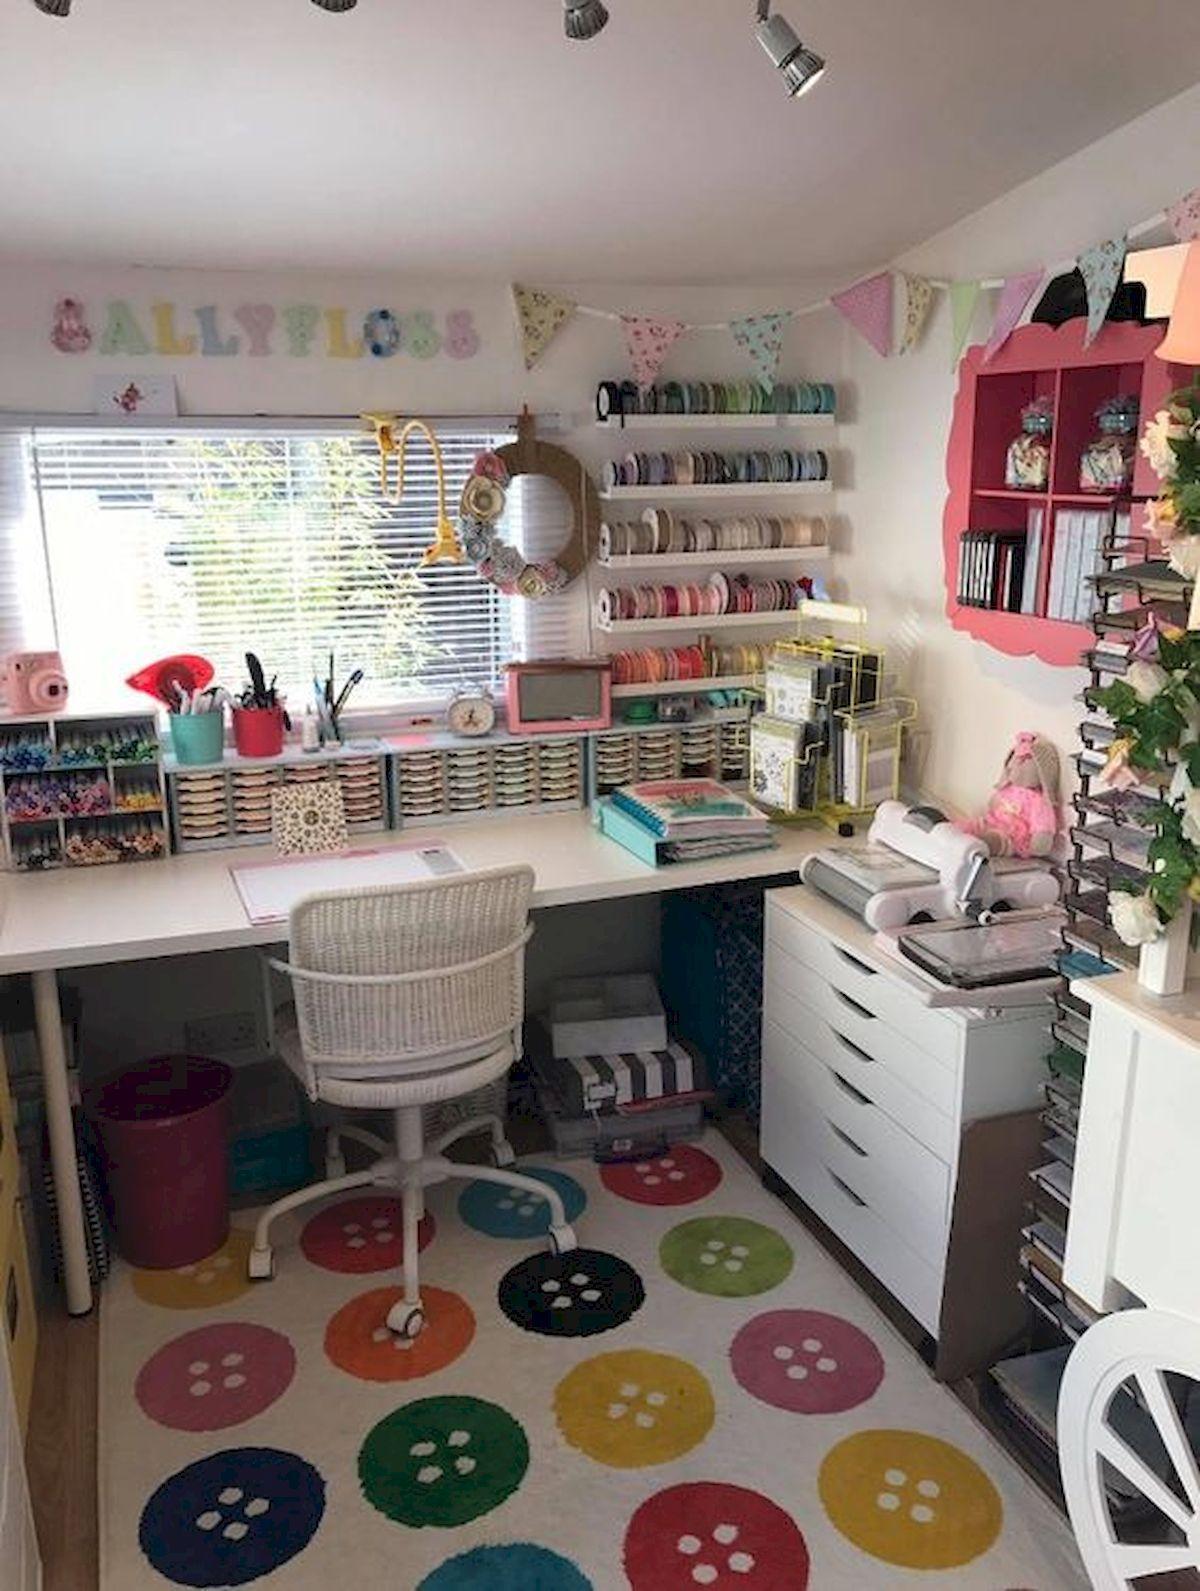 10+ Craft ideas for home decor ideas ideas in 2021